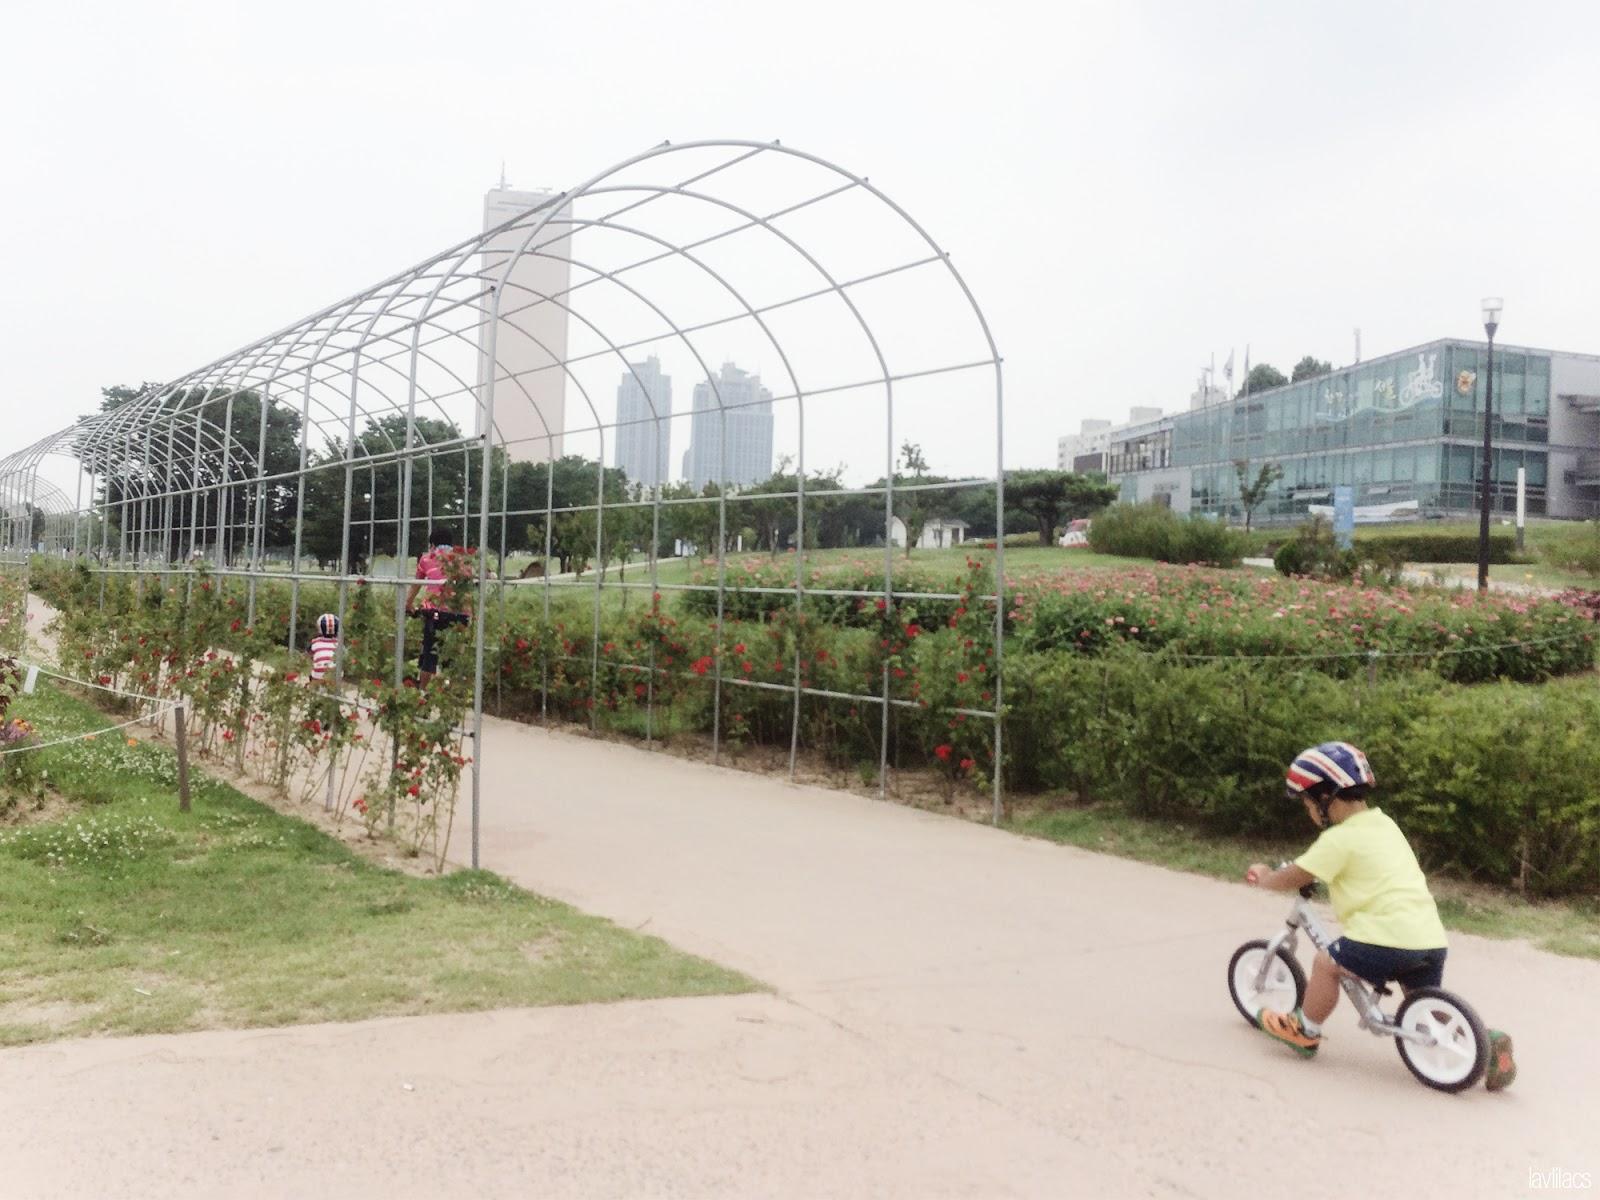 Seoul, Korea - Summer Study Abroad 2014 - Yeouido Park - Han River - family biking